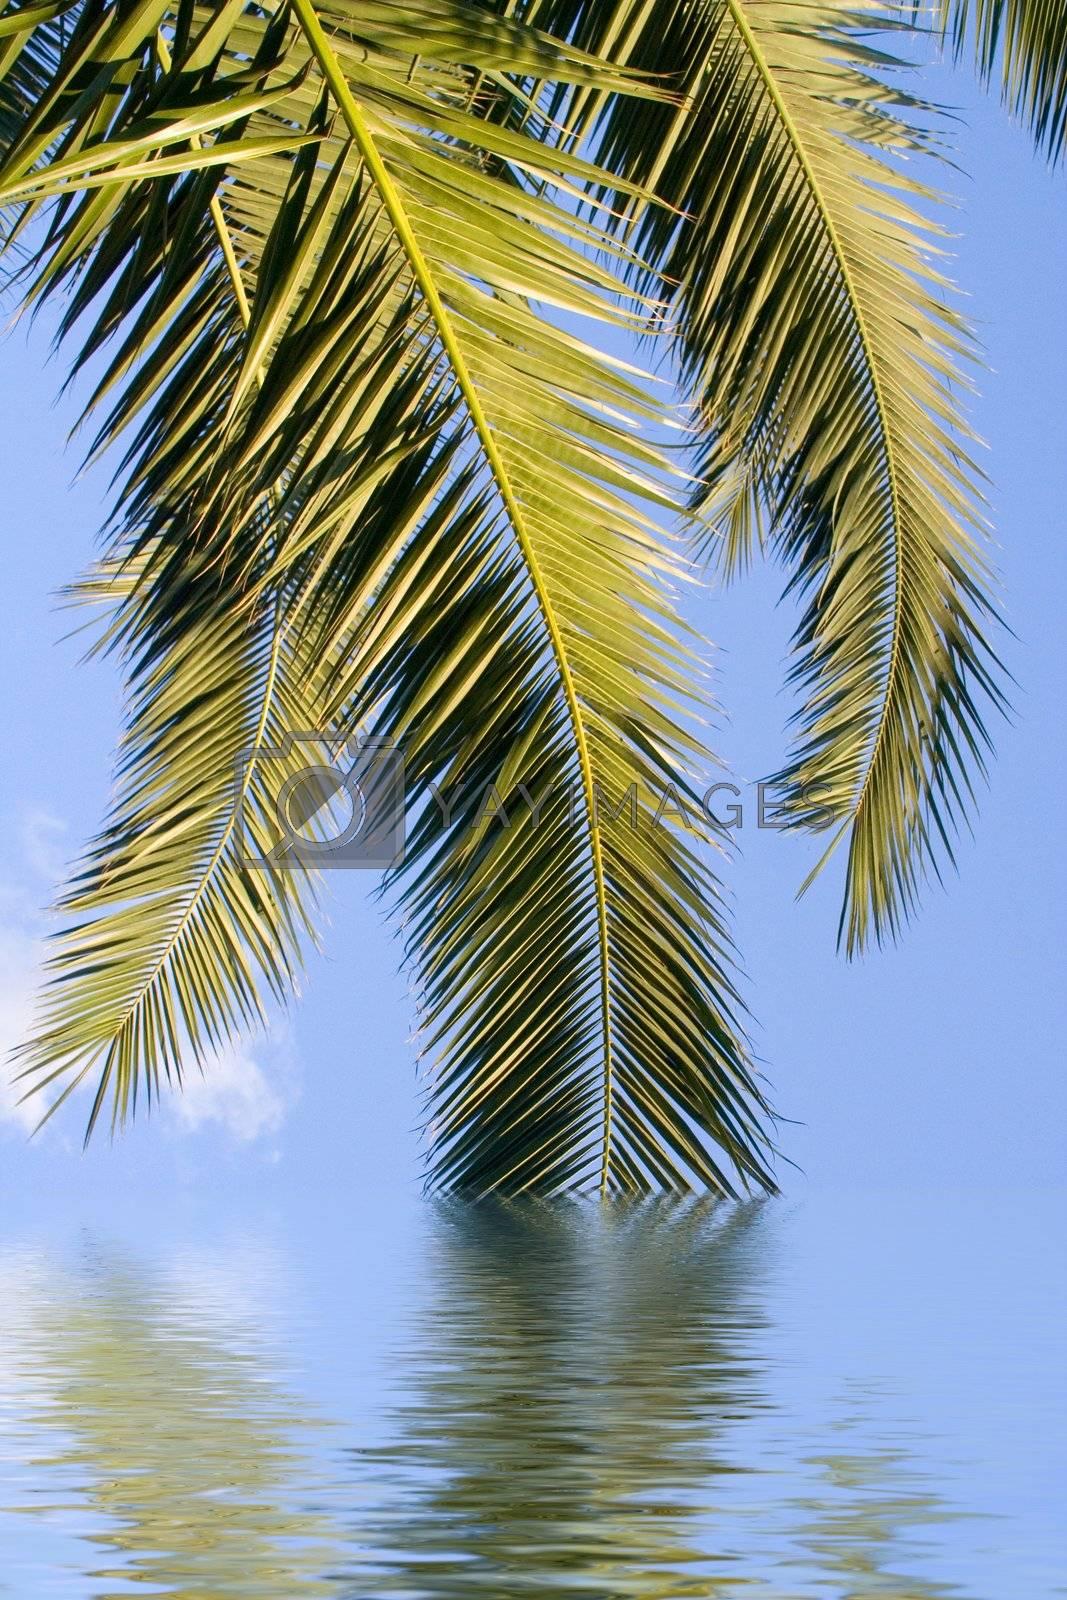 leaves sky water sunlight tree waves green blue